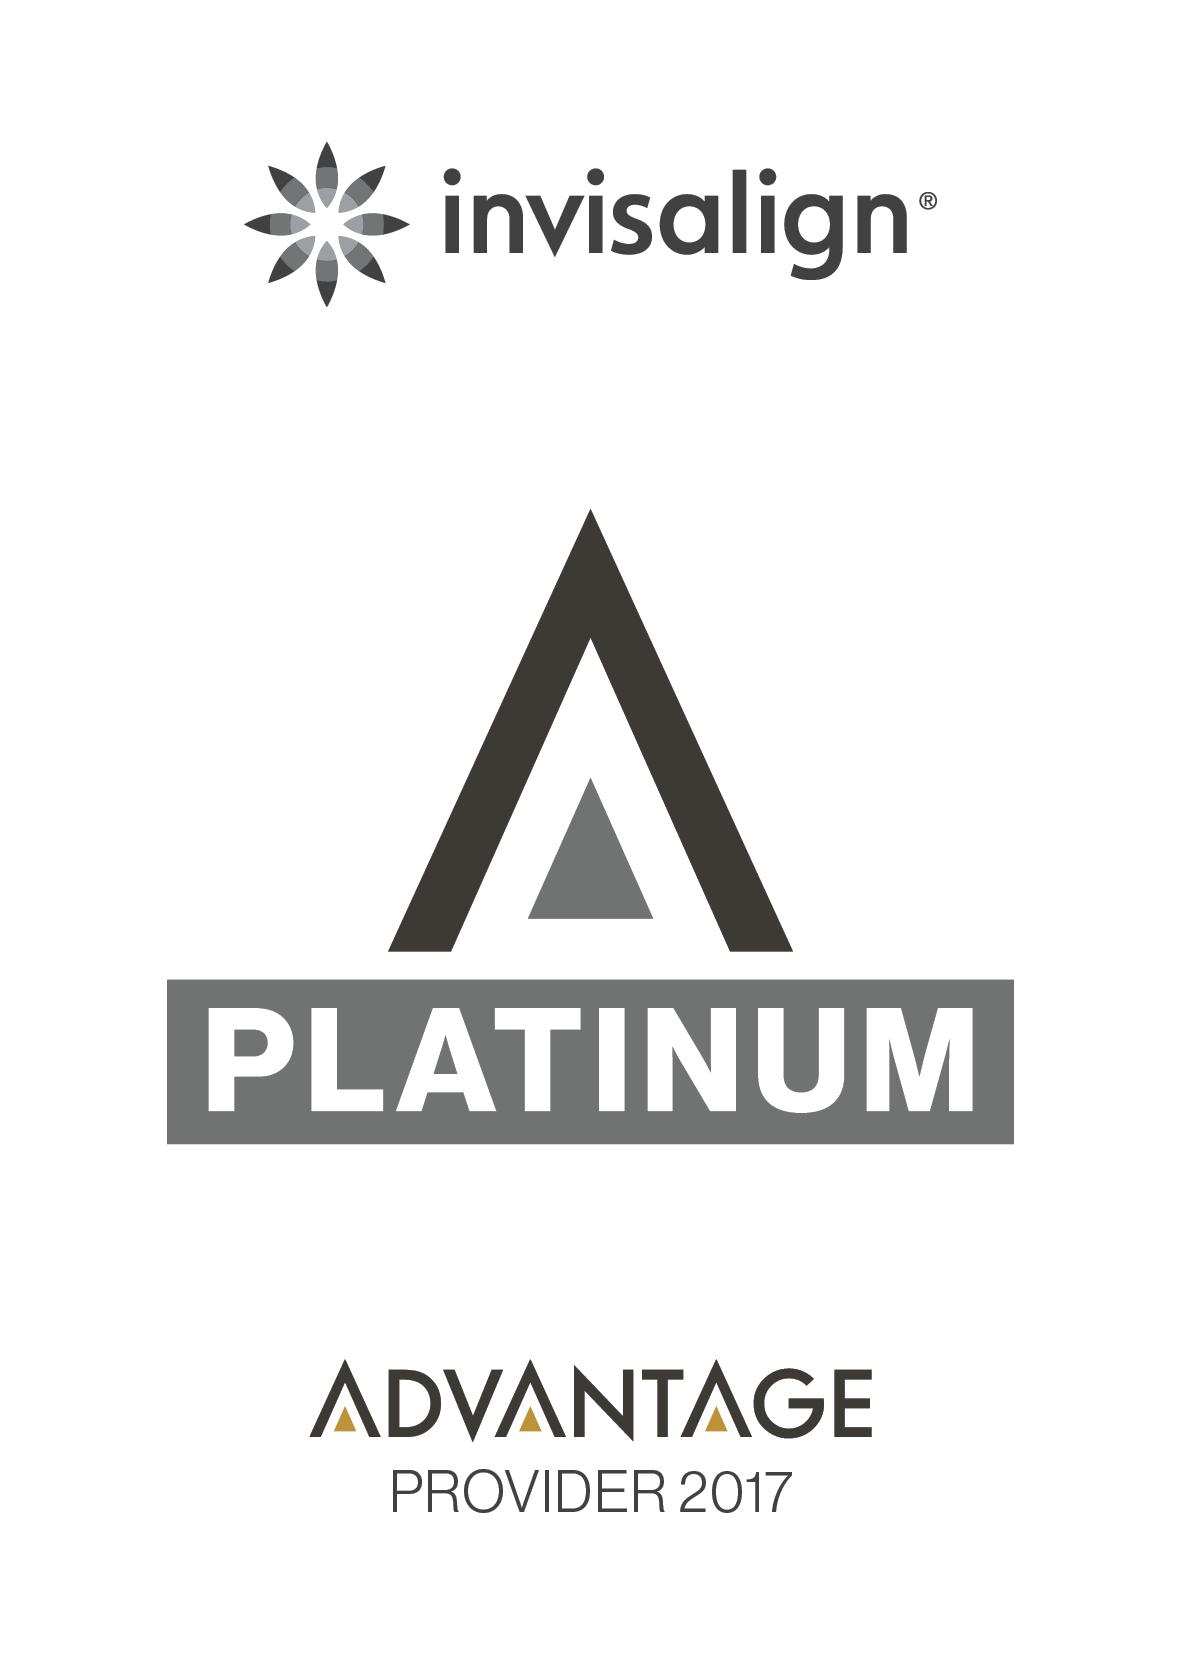 We are a Platinum Provider of Invisalign